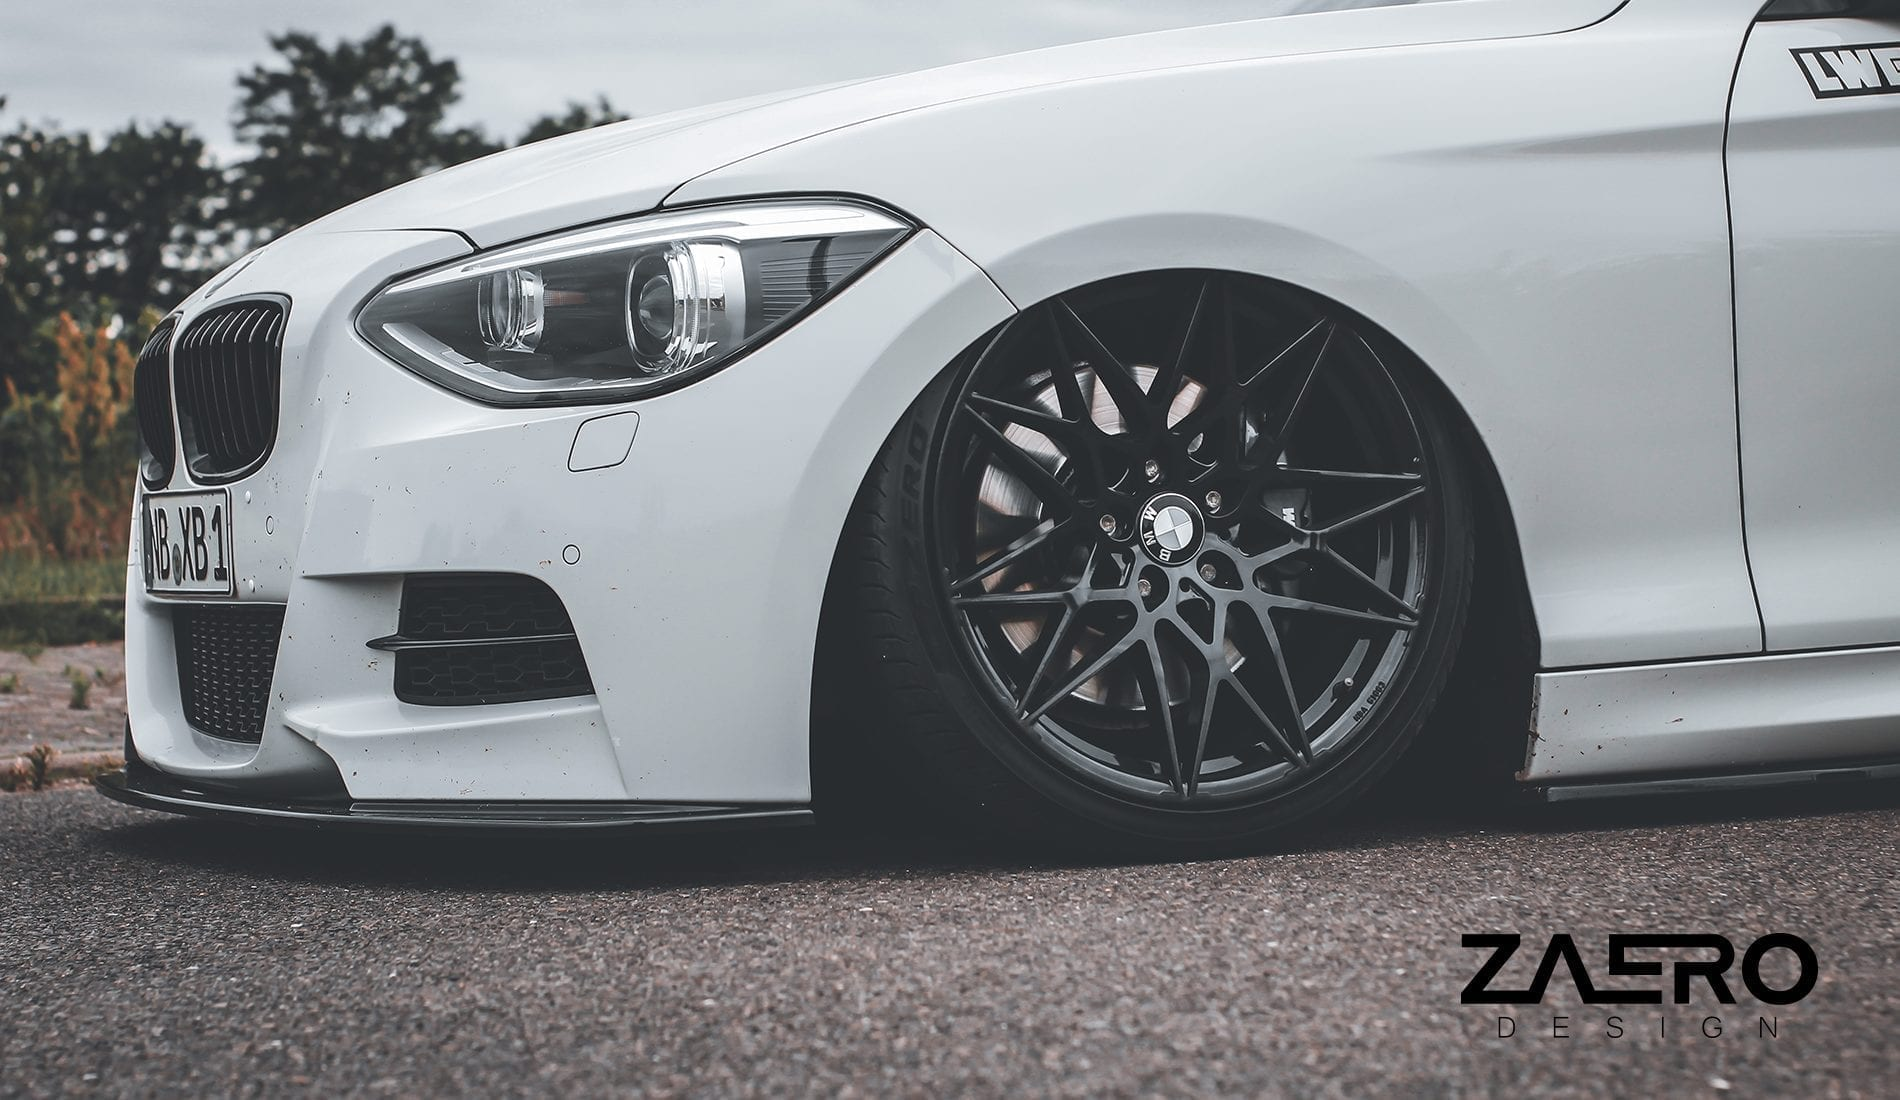 ZAERO-DESIGN-EVO-1-FRONT-LIP-FOR-BMW-1-SERIES-116i-118i-120i-125i-M135-F20-F21-PRE-LCI-SPLITTER-SPOILER-BODY-KIT-EXTENSION